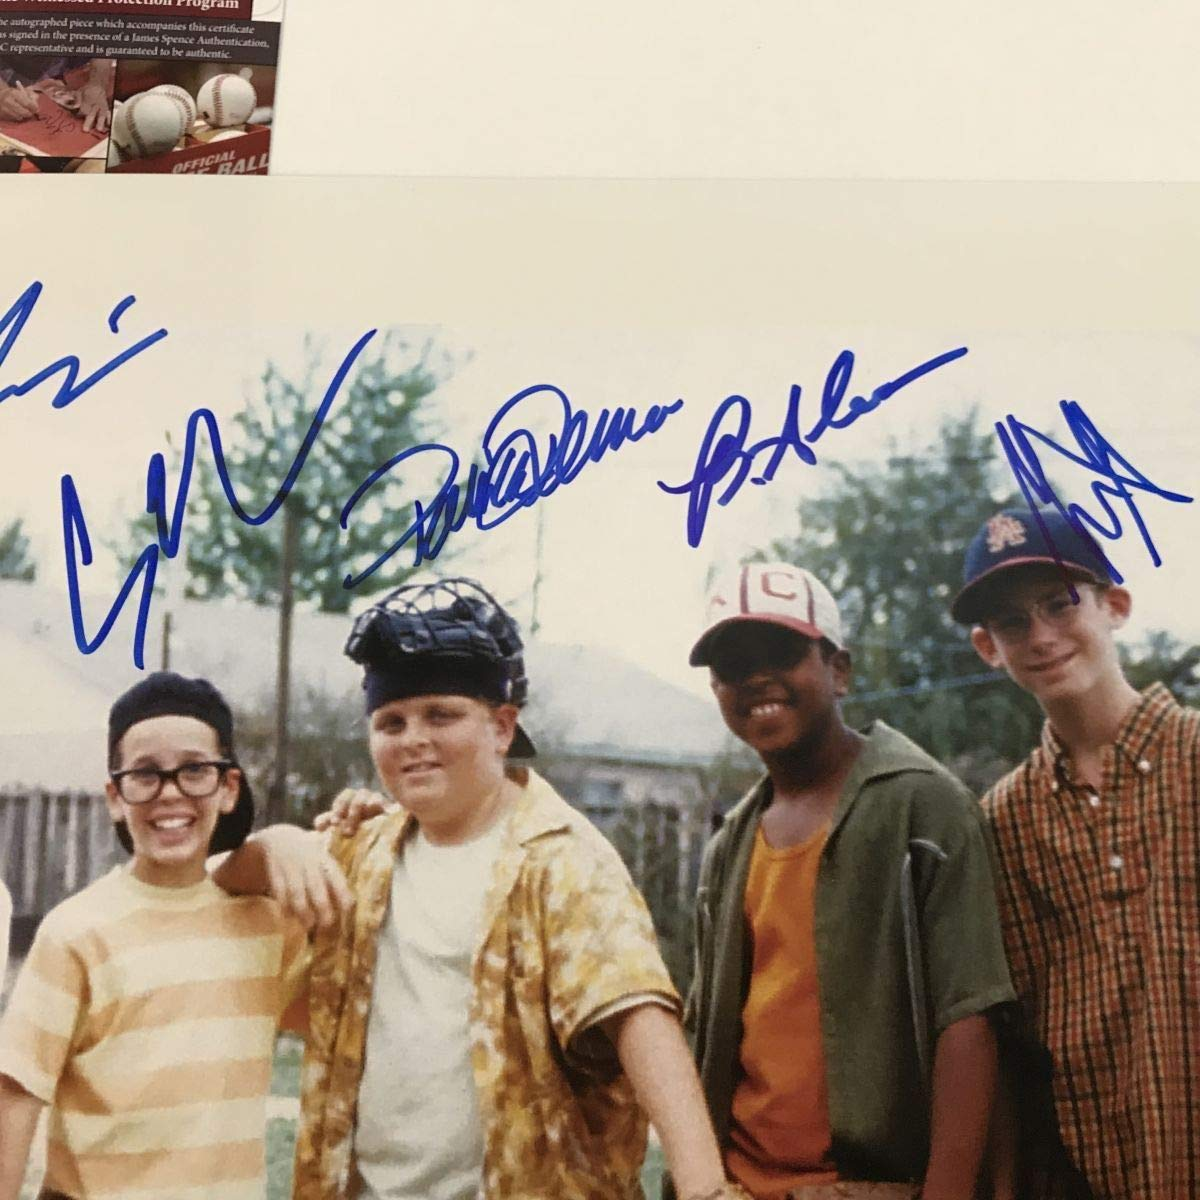 Framed Autographed//Signed The Sandlot Movie 8x Cast Member Sigs 16x20 Baseball Photo JSA COA